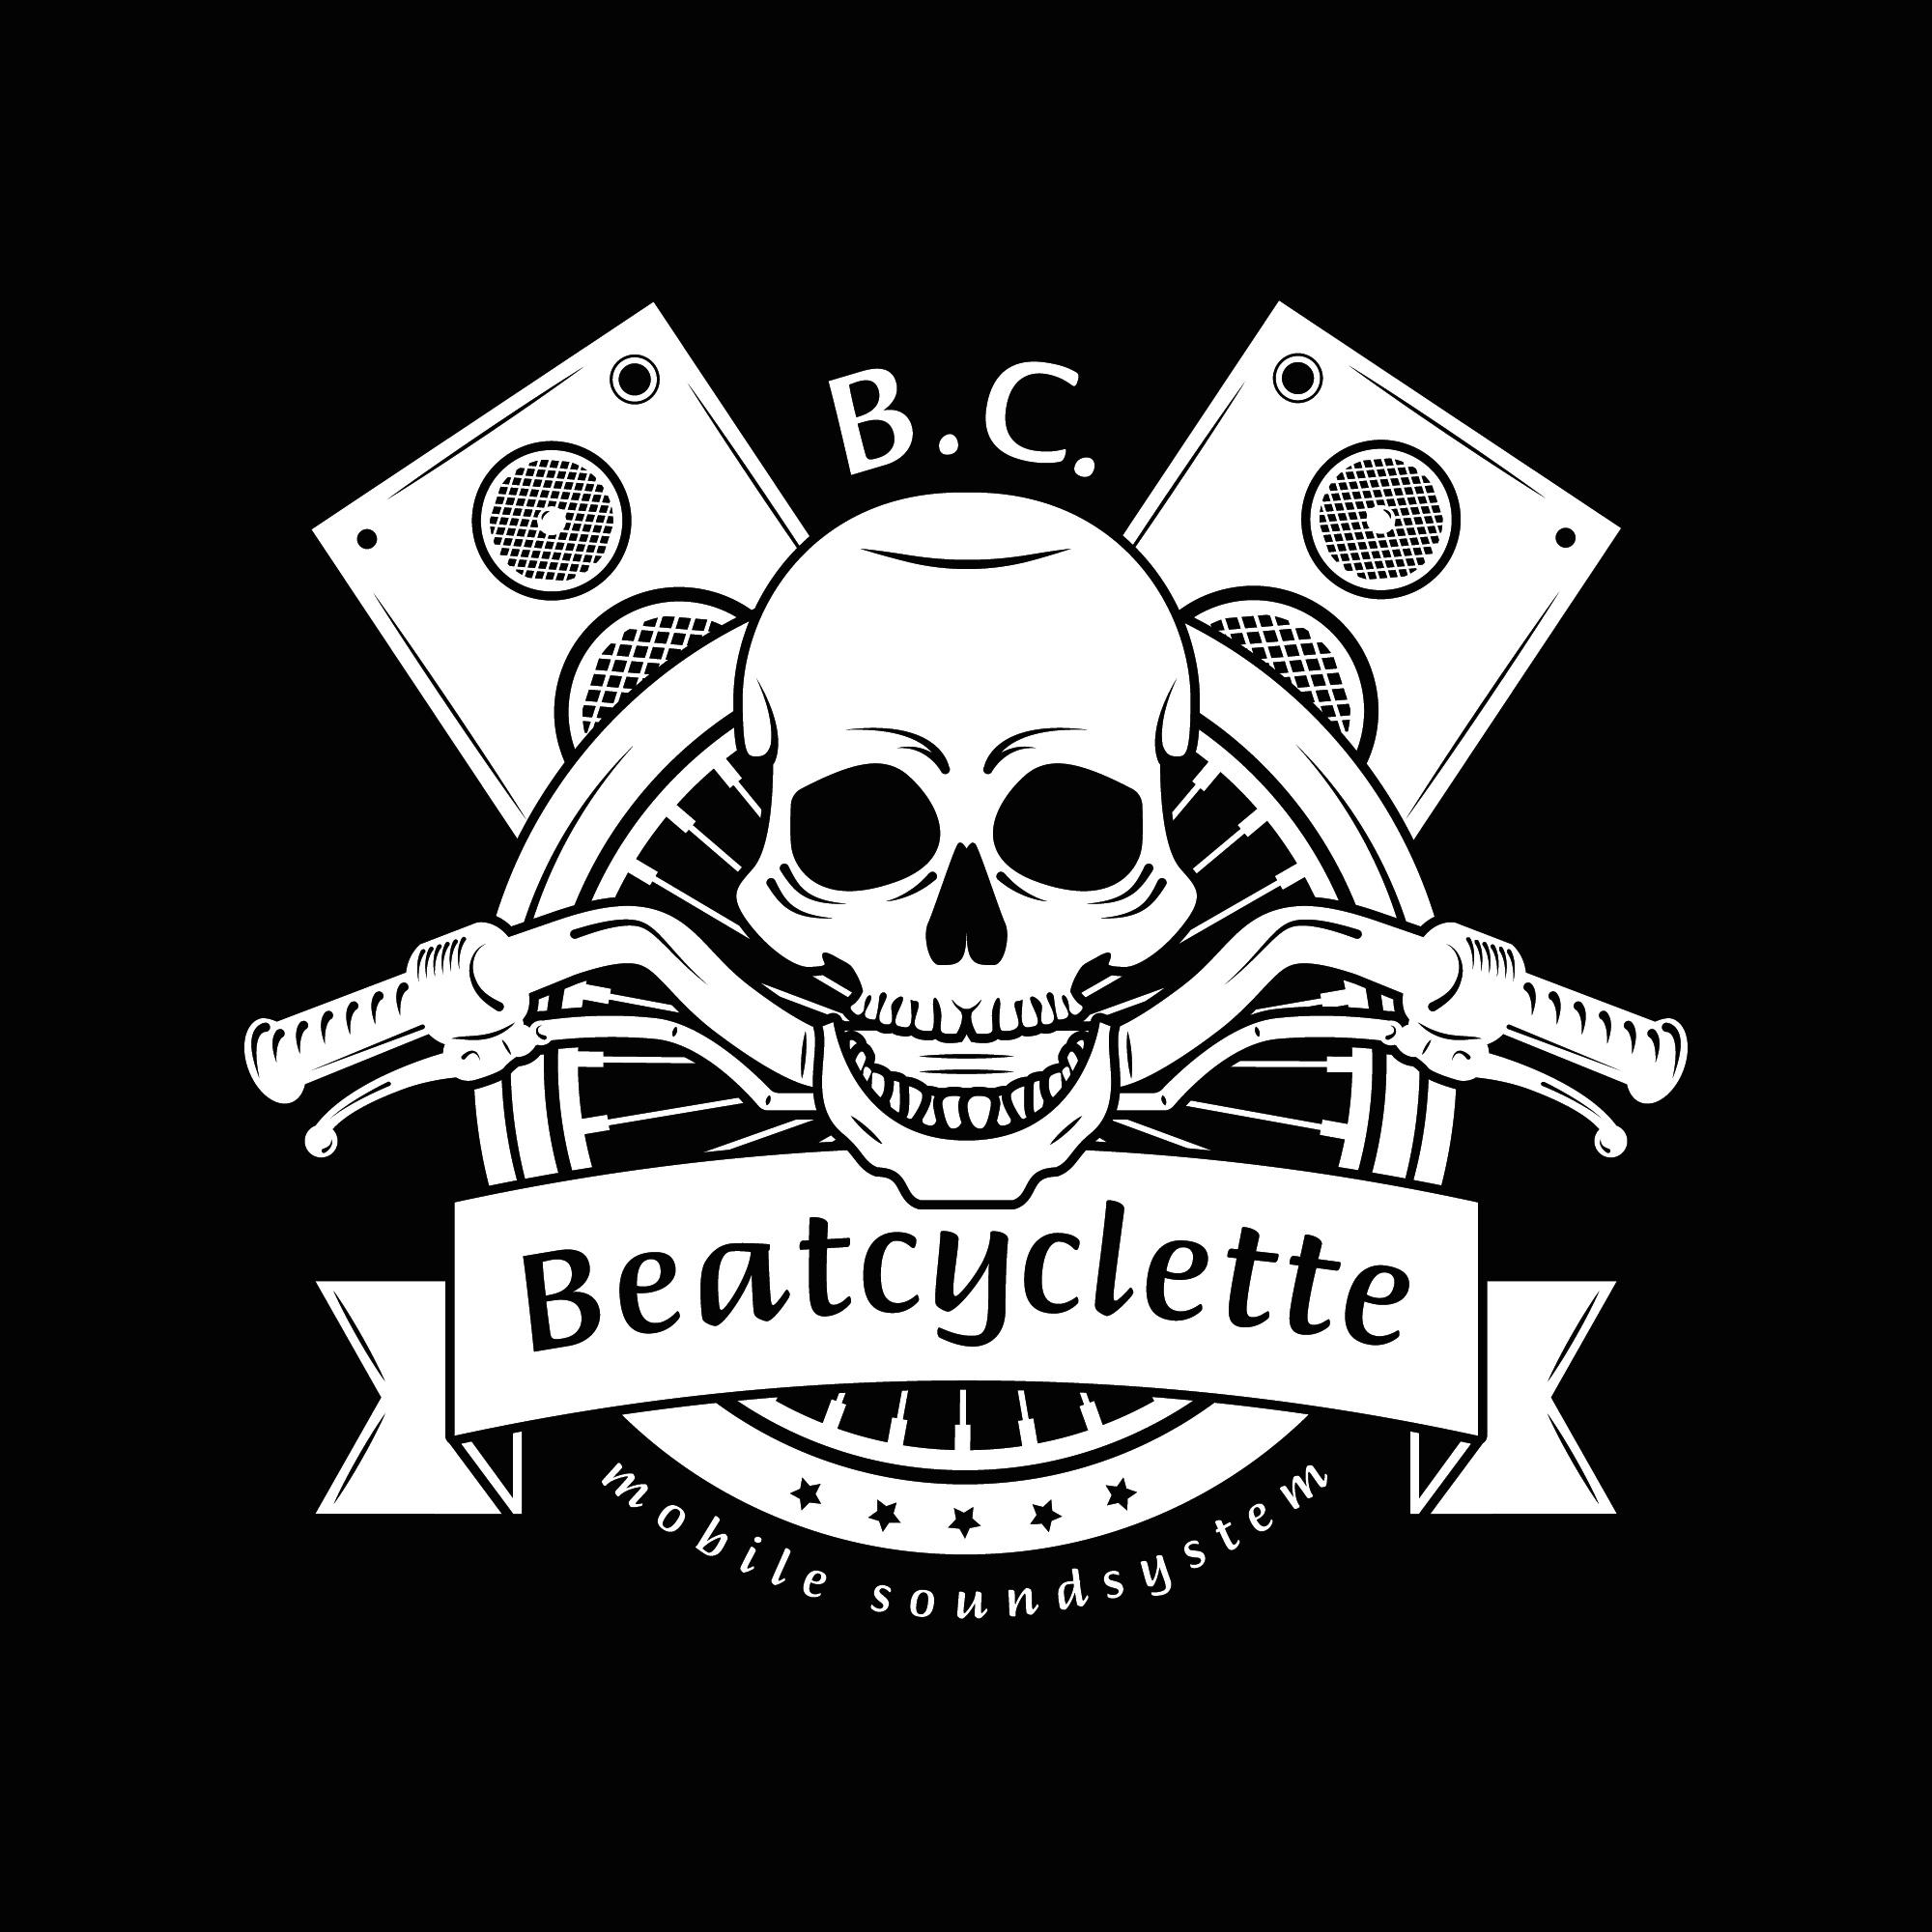 beatcyclette logo V3